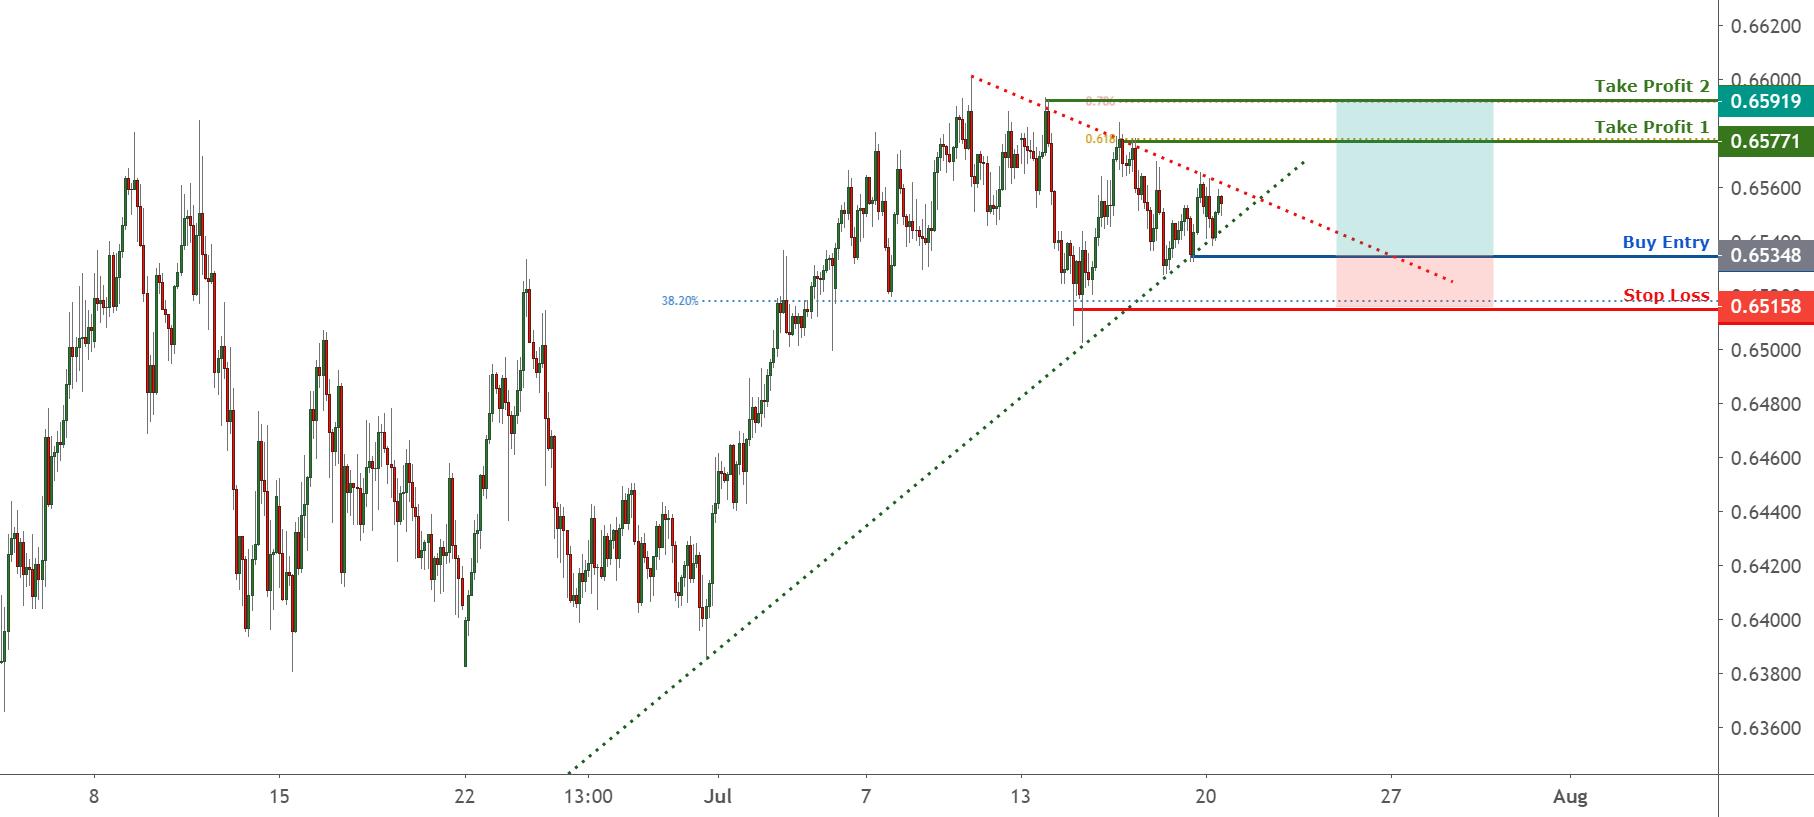 NZDUSD on a rising trend !| 20 July for FX:NZDUSD by FXCM